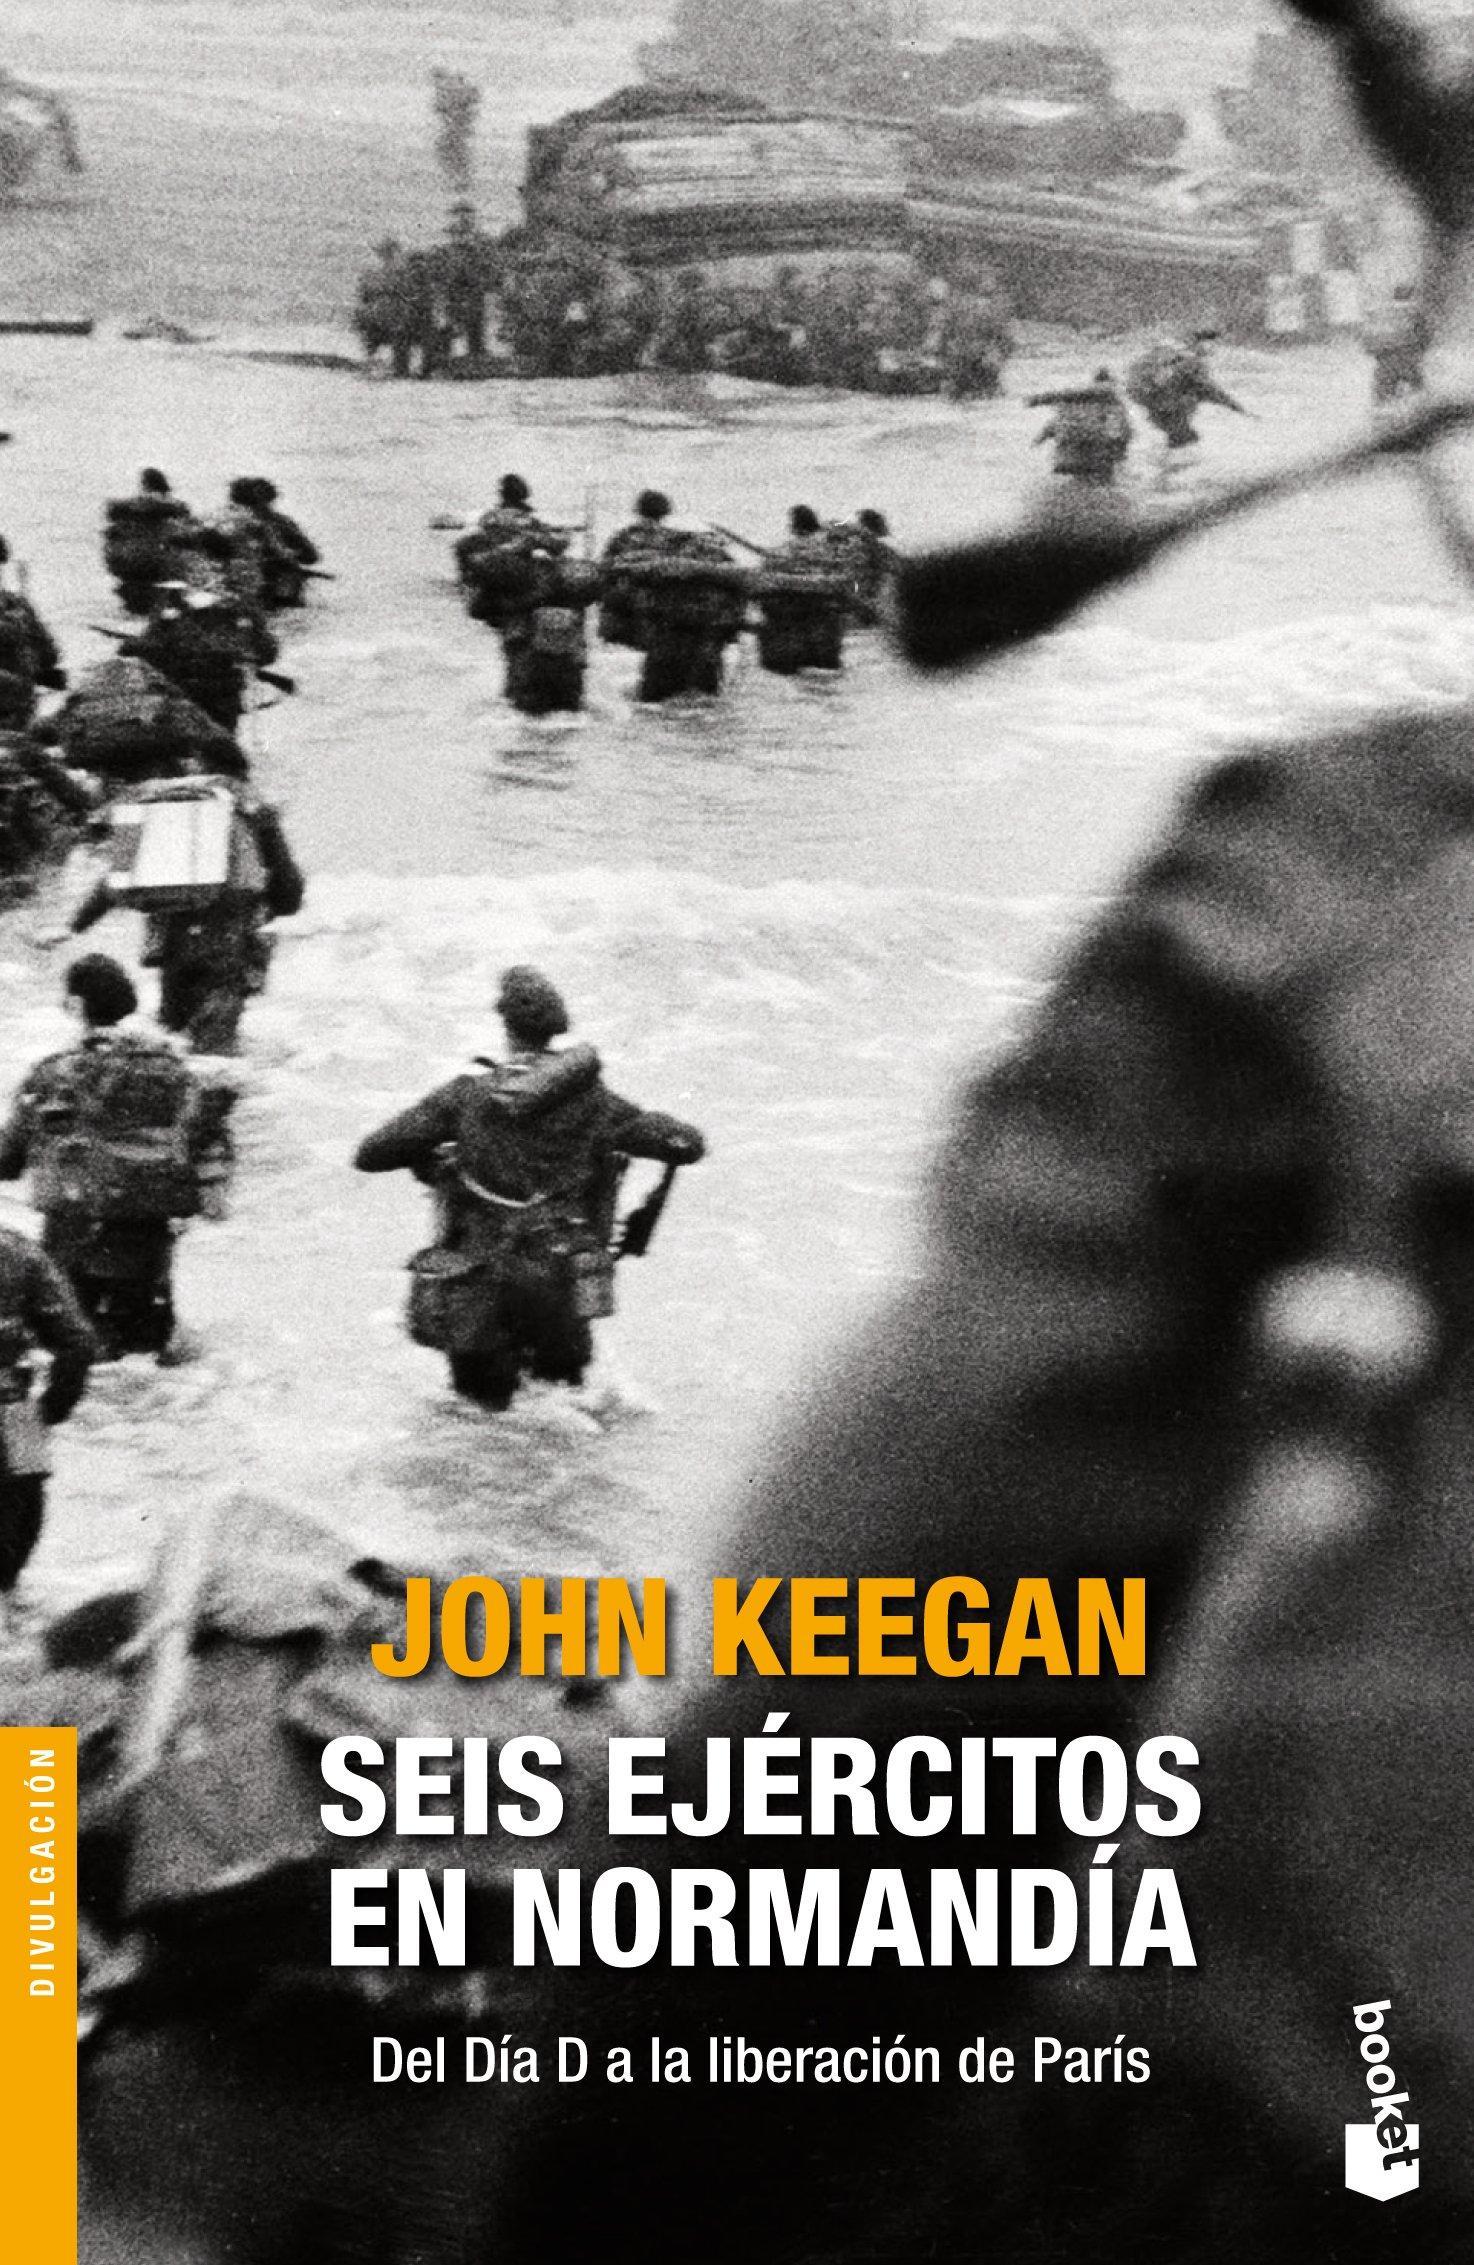 Portada del libro SEIS EJÉRCITOS EN NORMANDIA de John Keegan